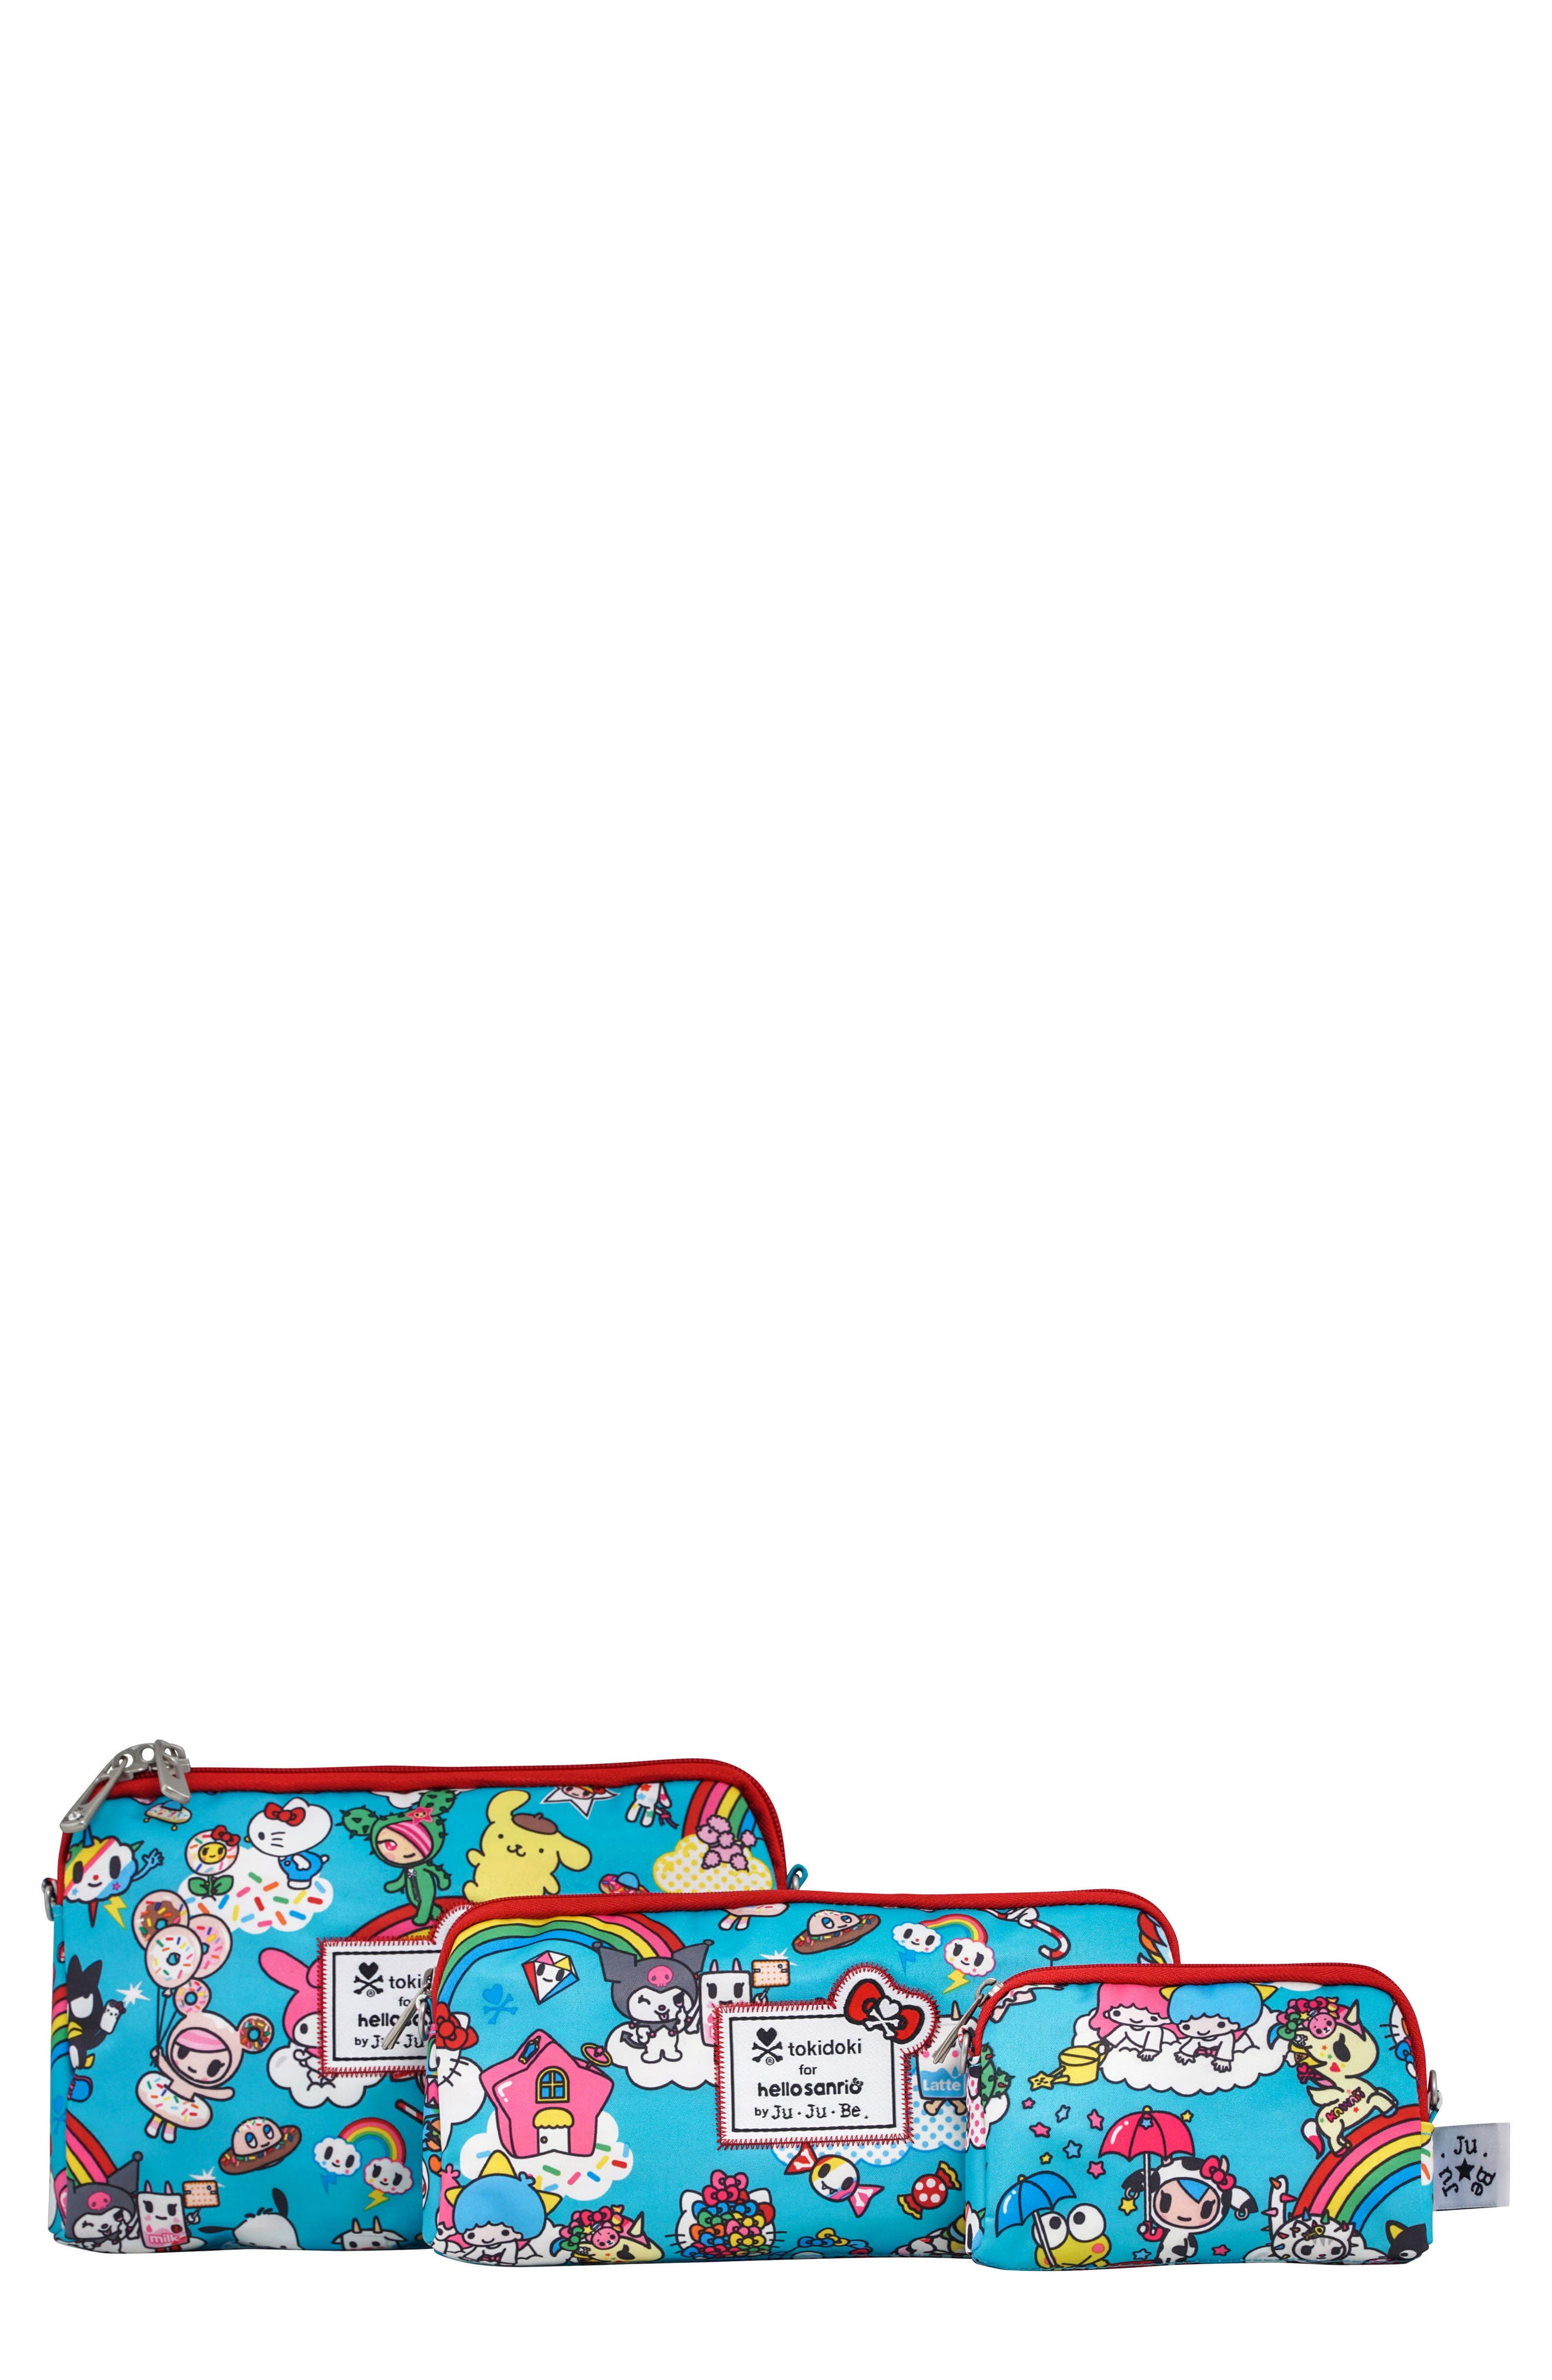 x tokidoki for Hello Sanrio Rainbow Dreams Be Organized Set of 3 Top Zip Cases,                             Main thumbnail 1, color,